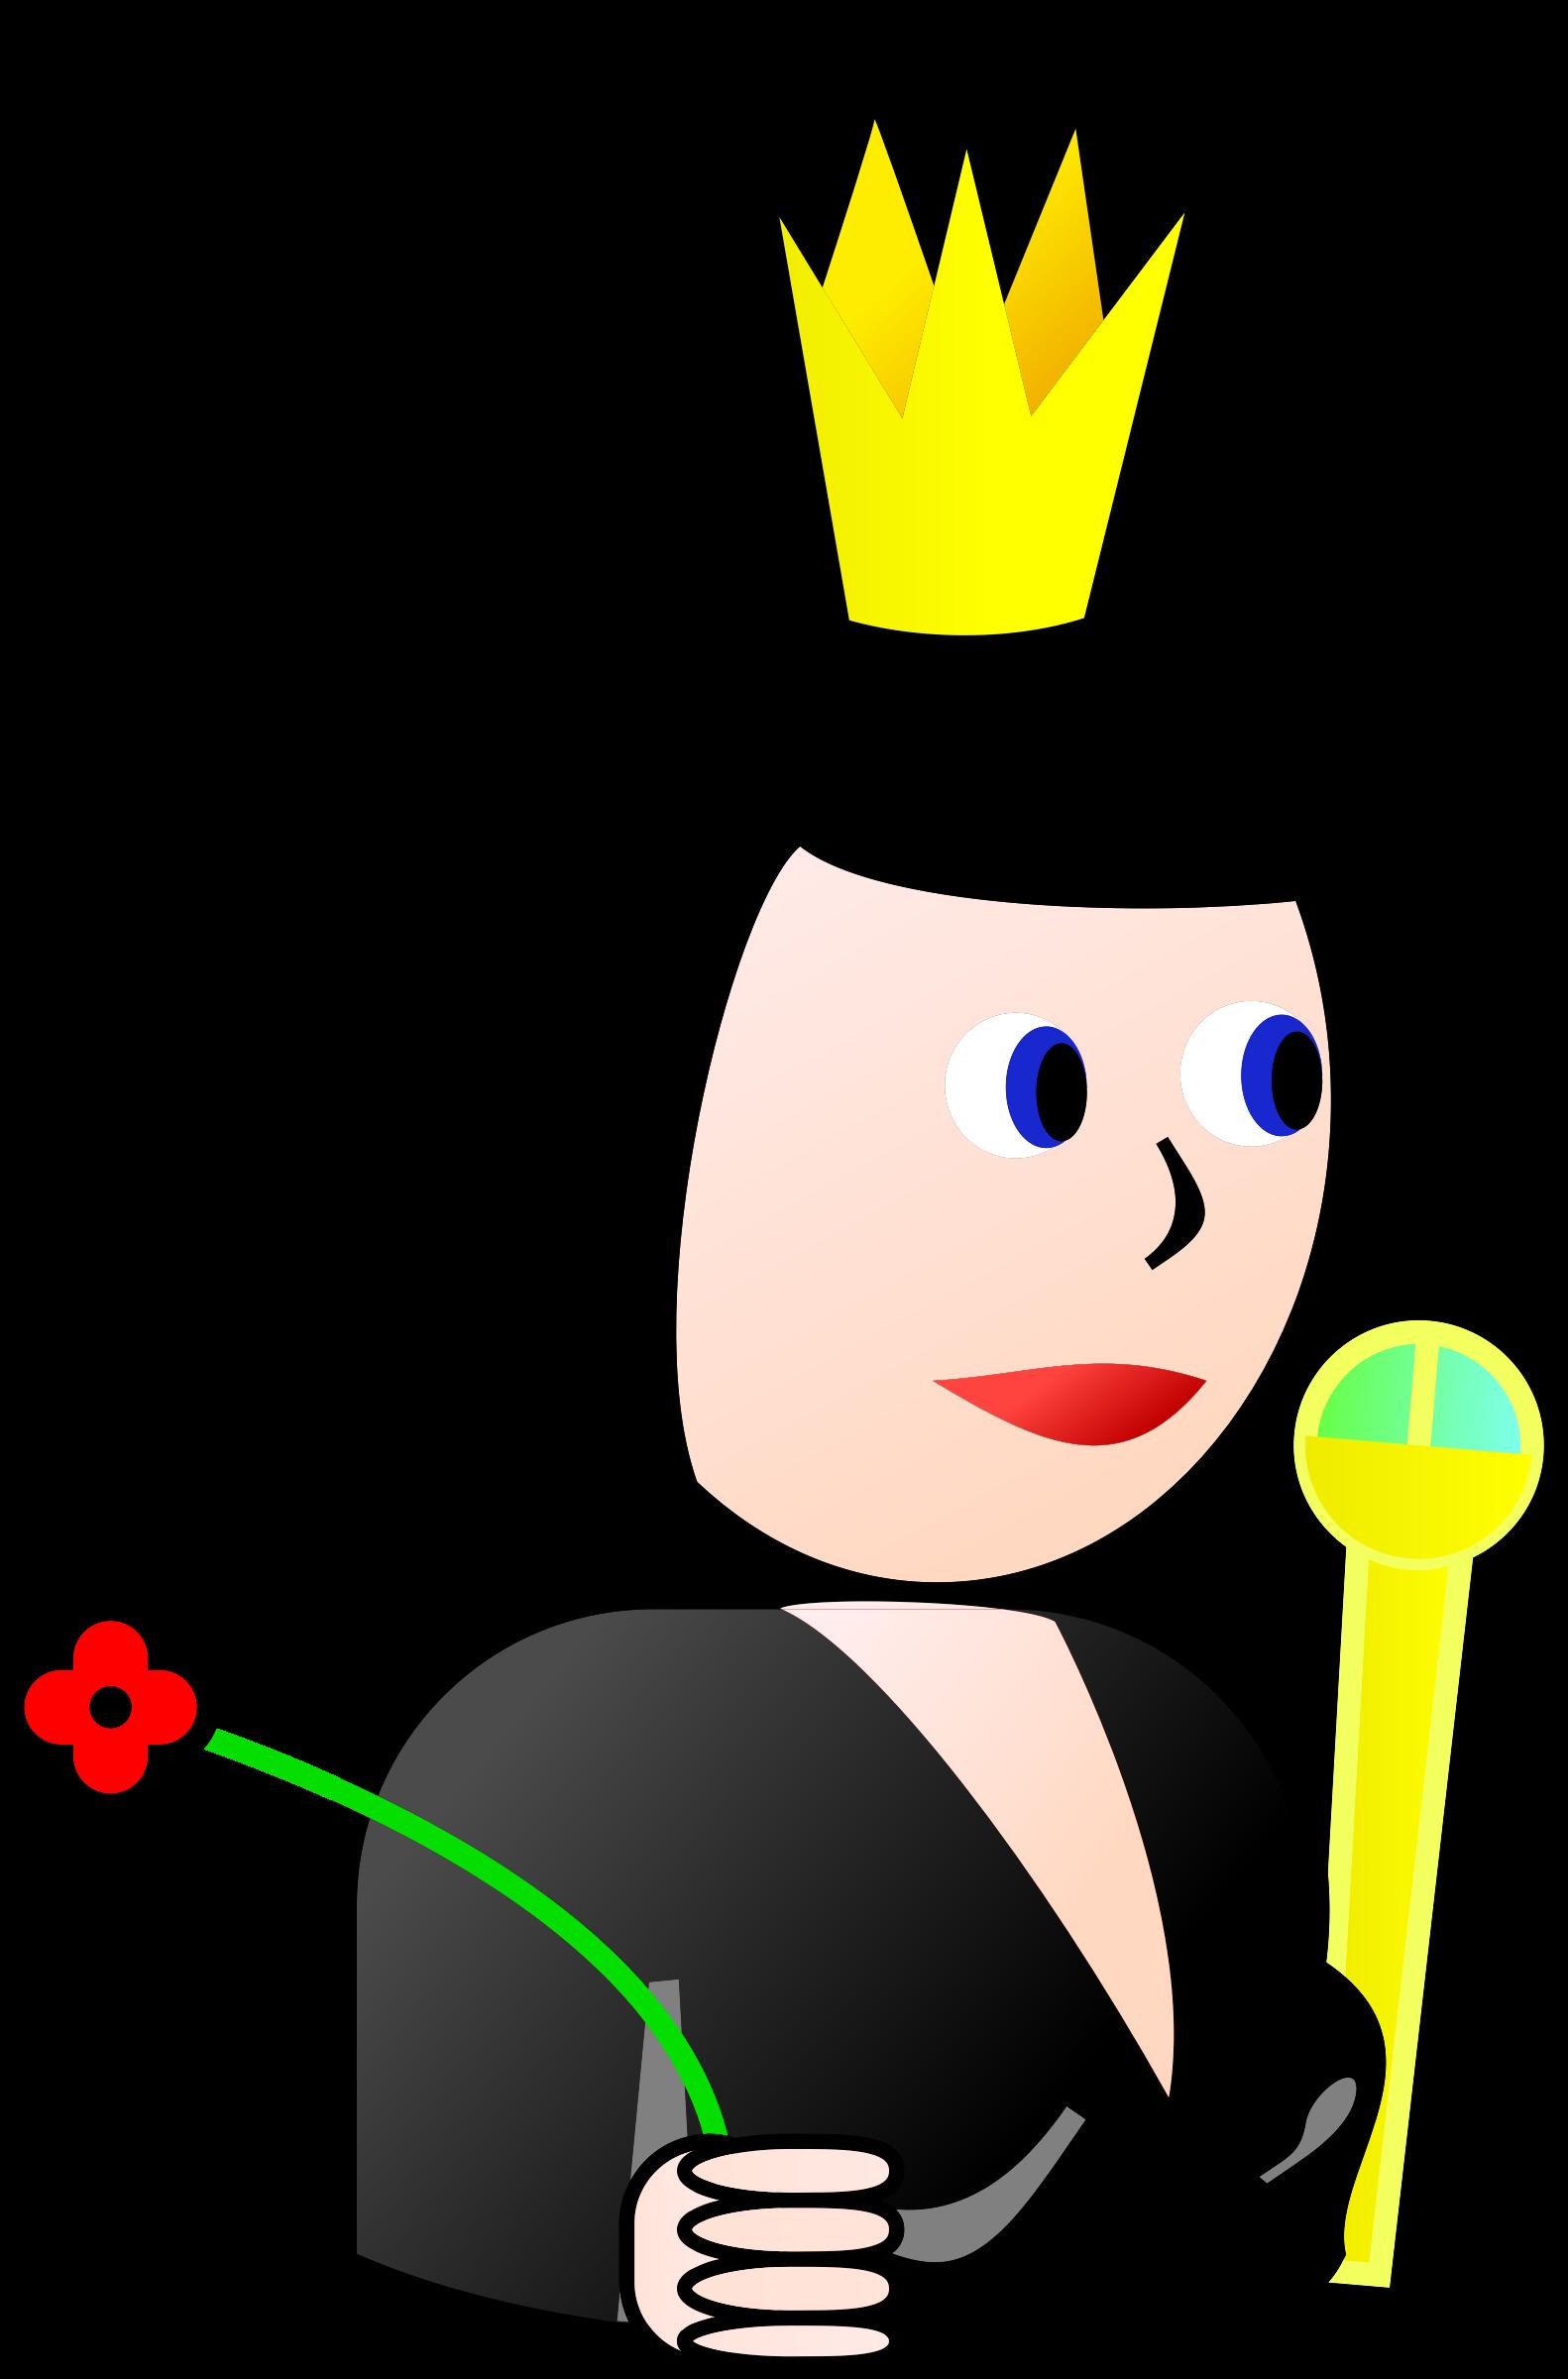 Queen clipart spades #12